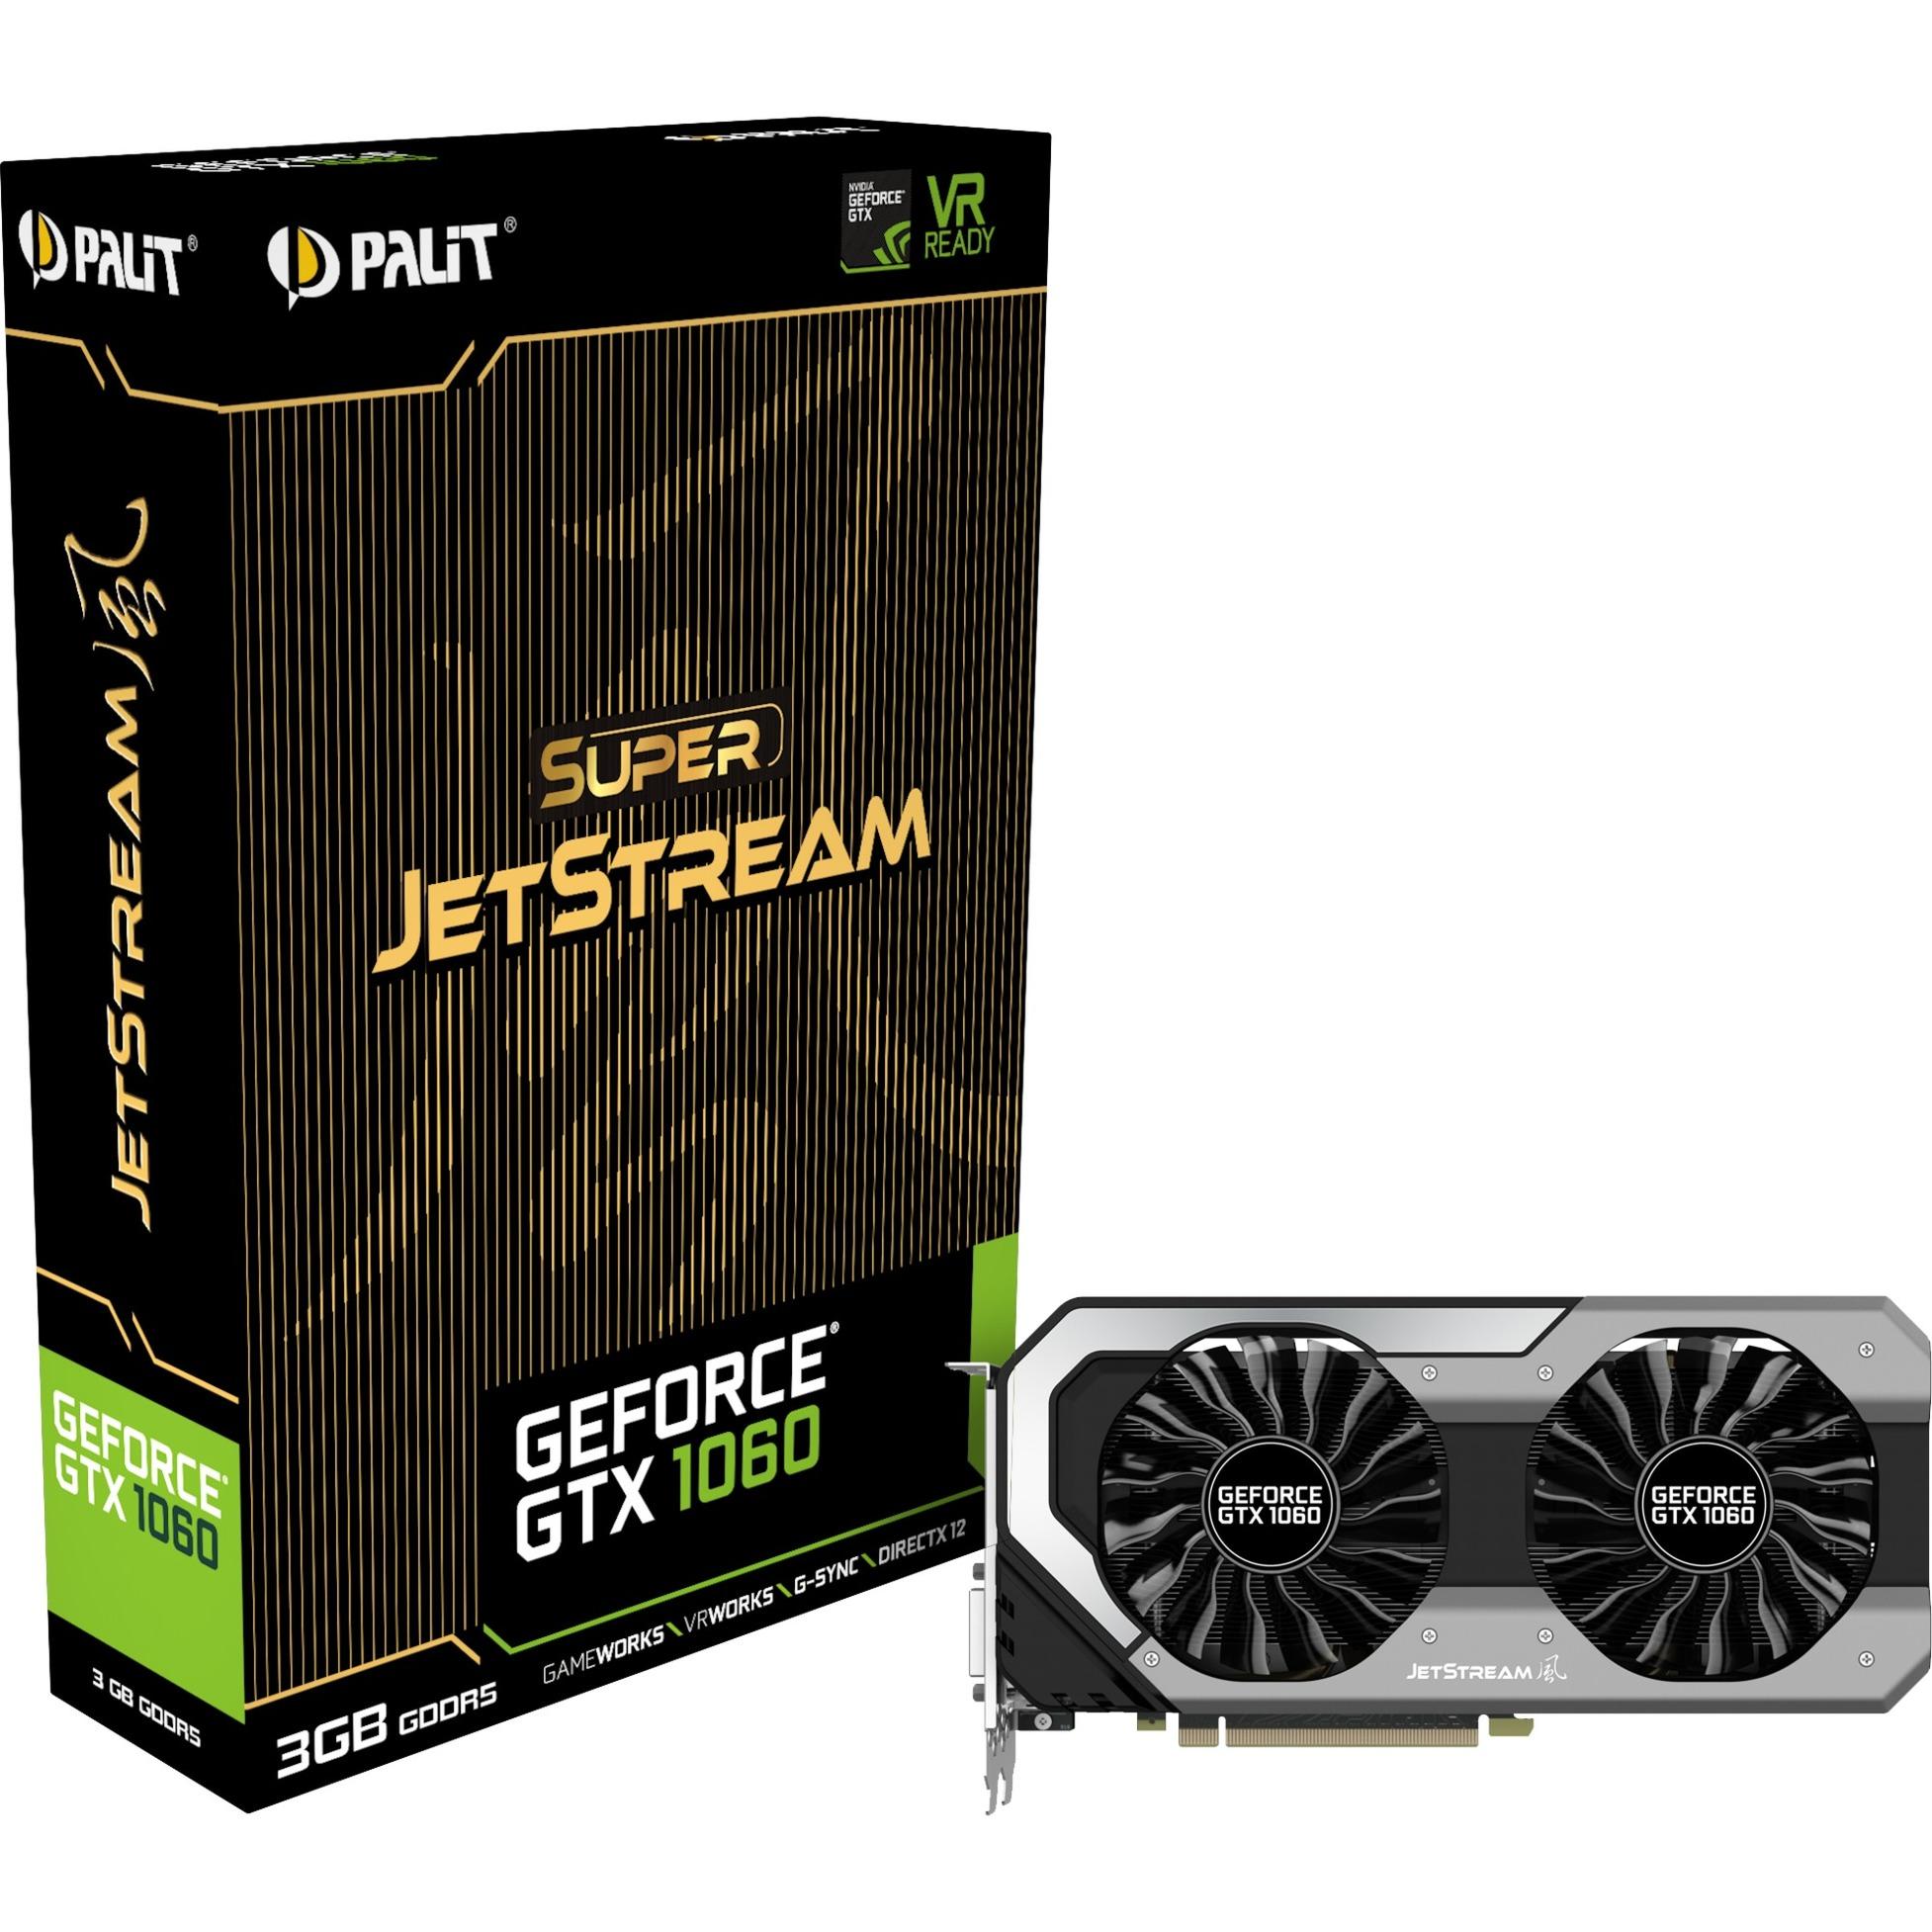 GeForce GTX 1060 Super Jetstream, Tarjeta gráfica